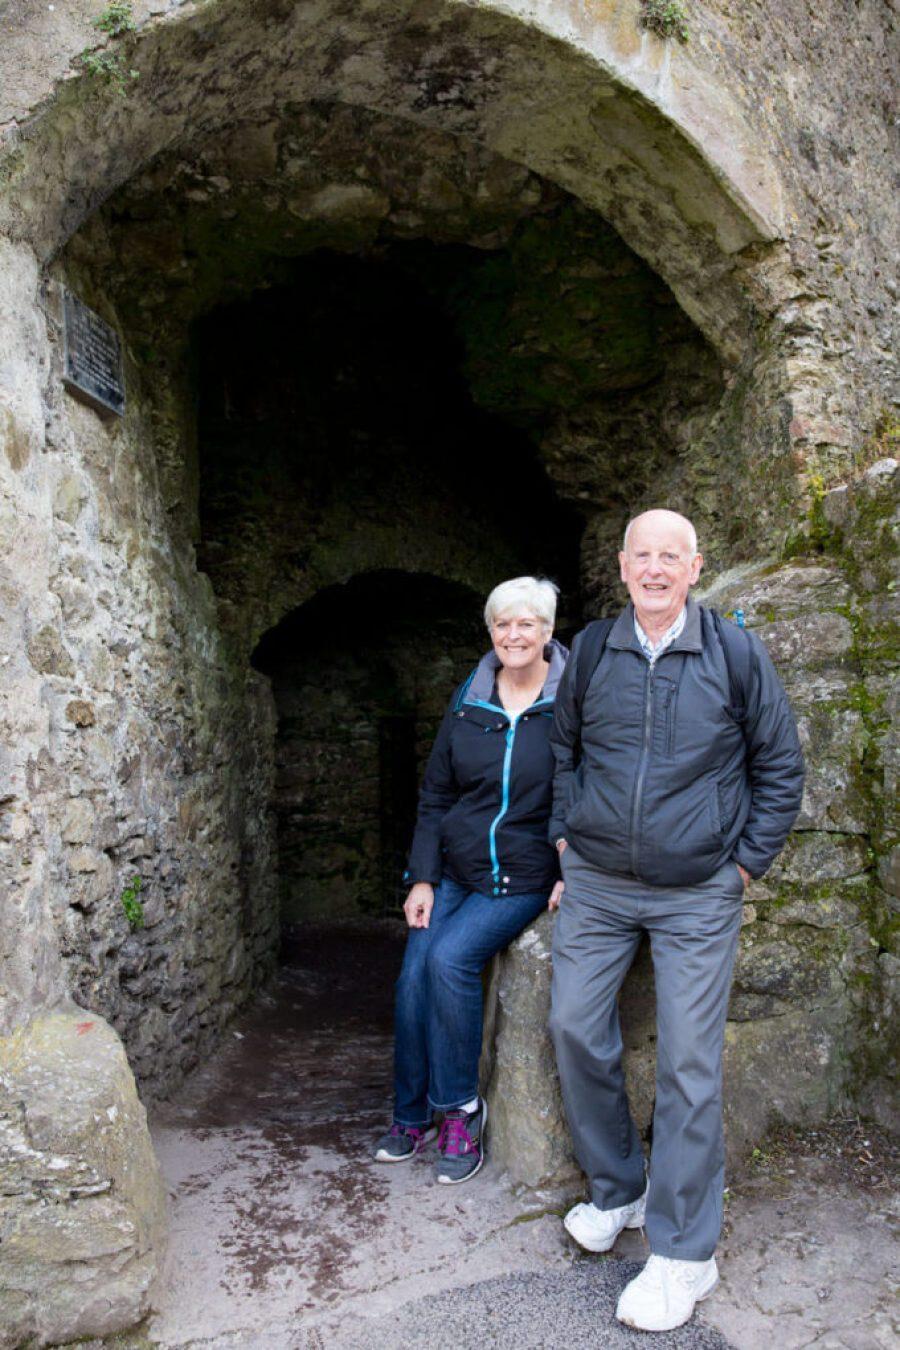 Blarney Castle dungeon